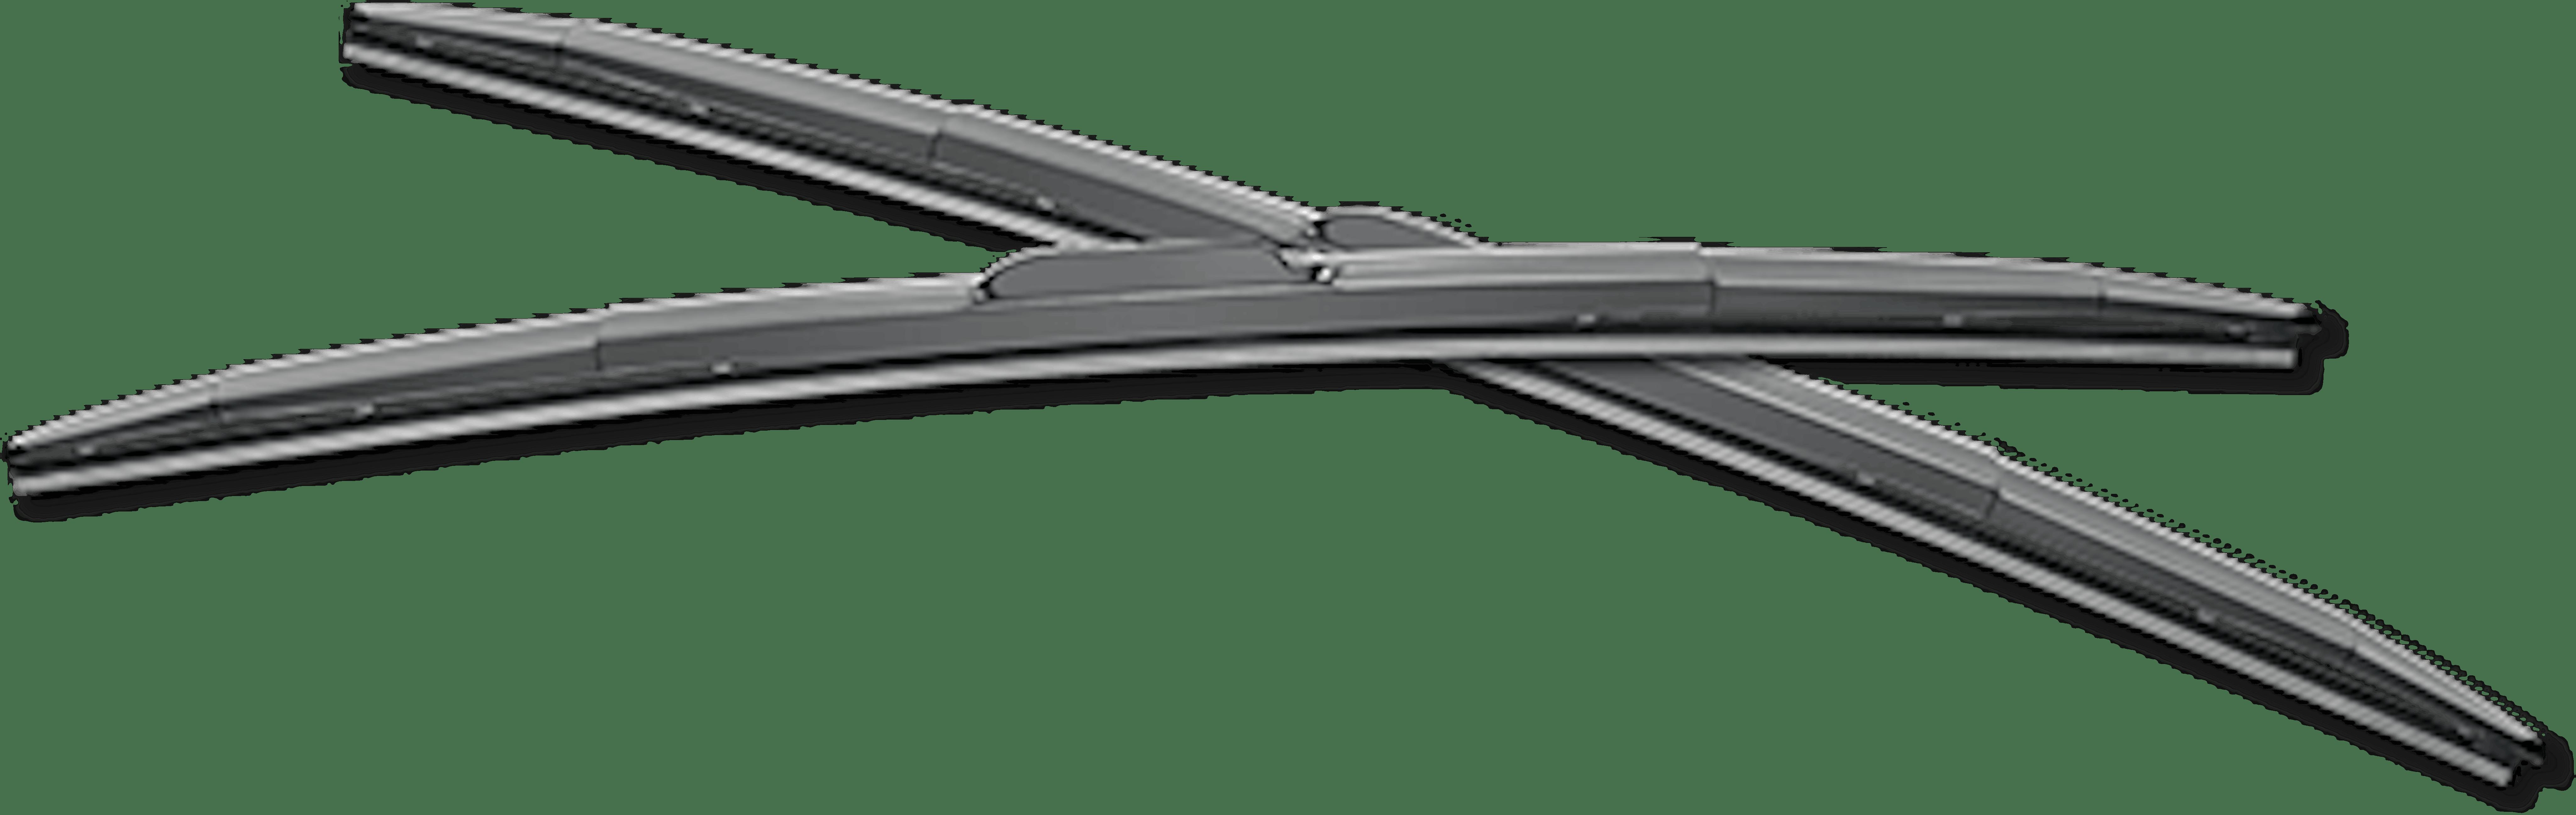 service specials image - wiper blades